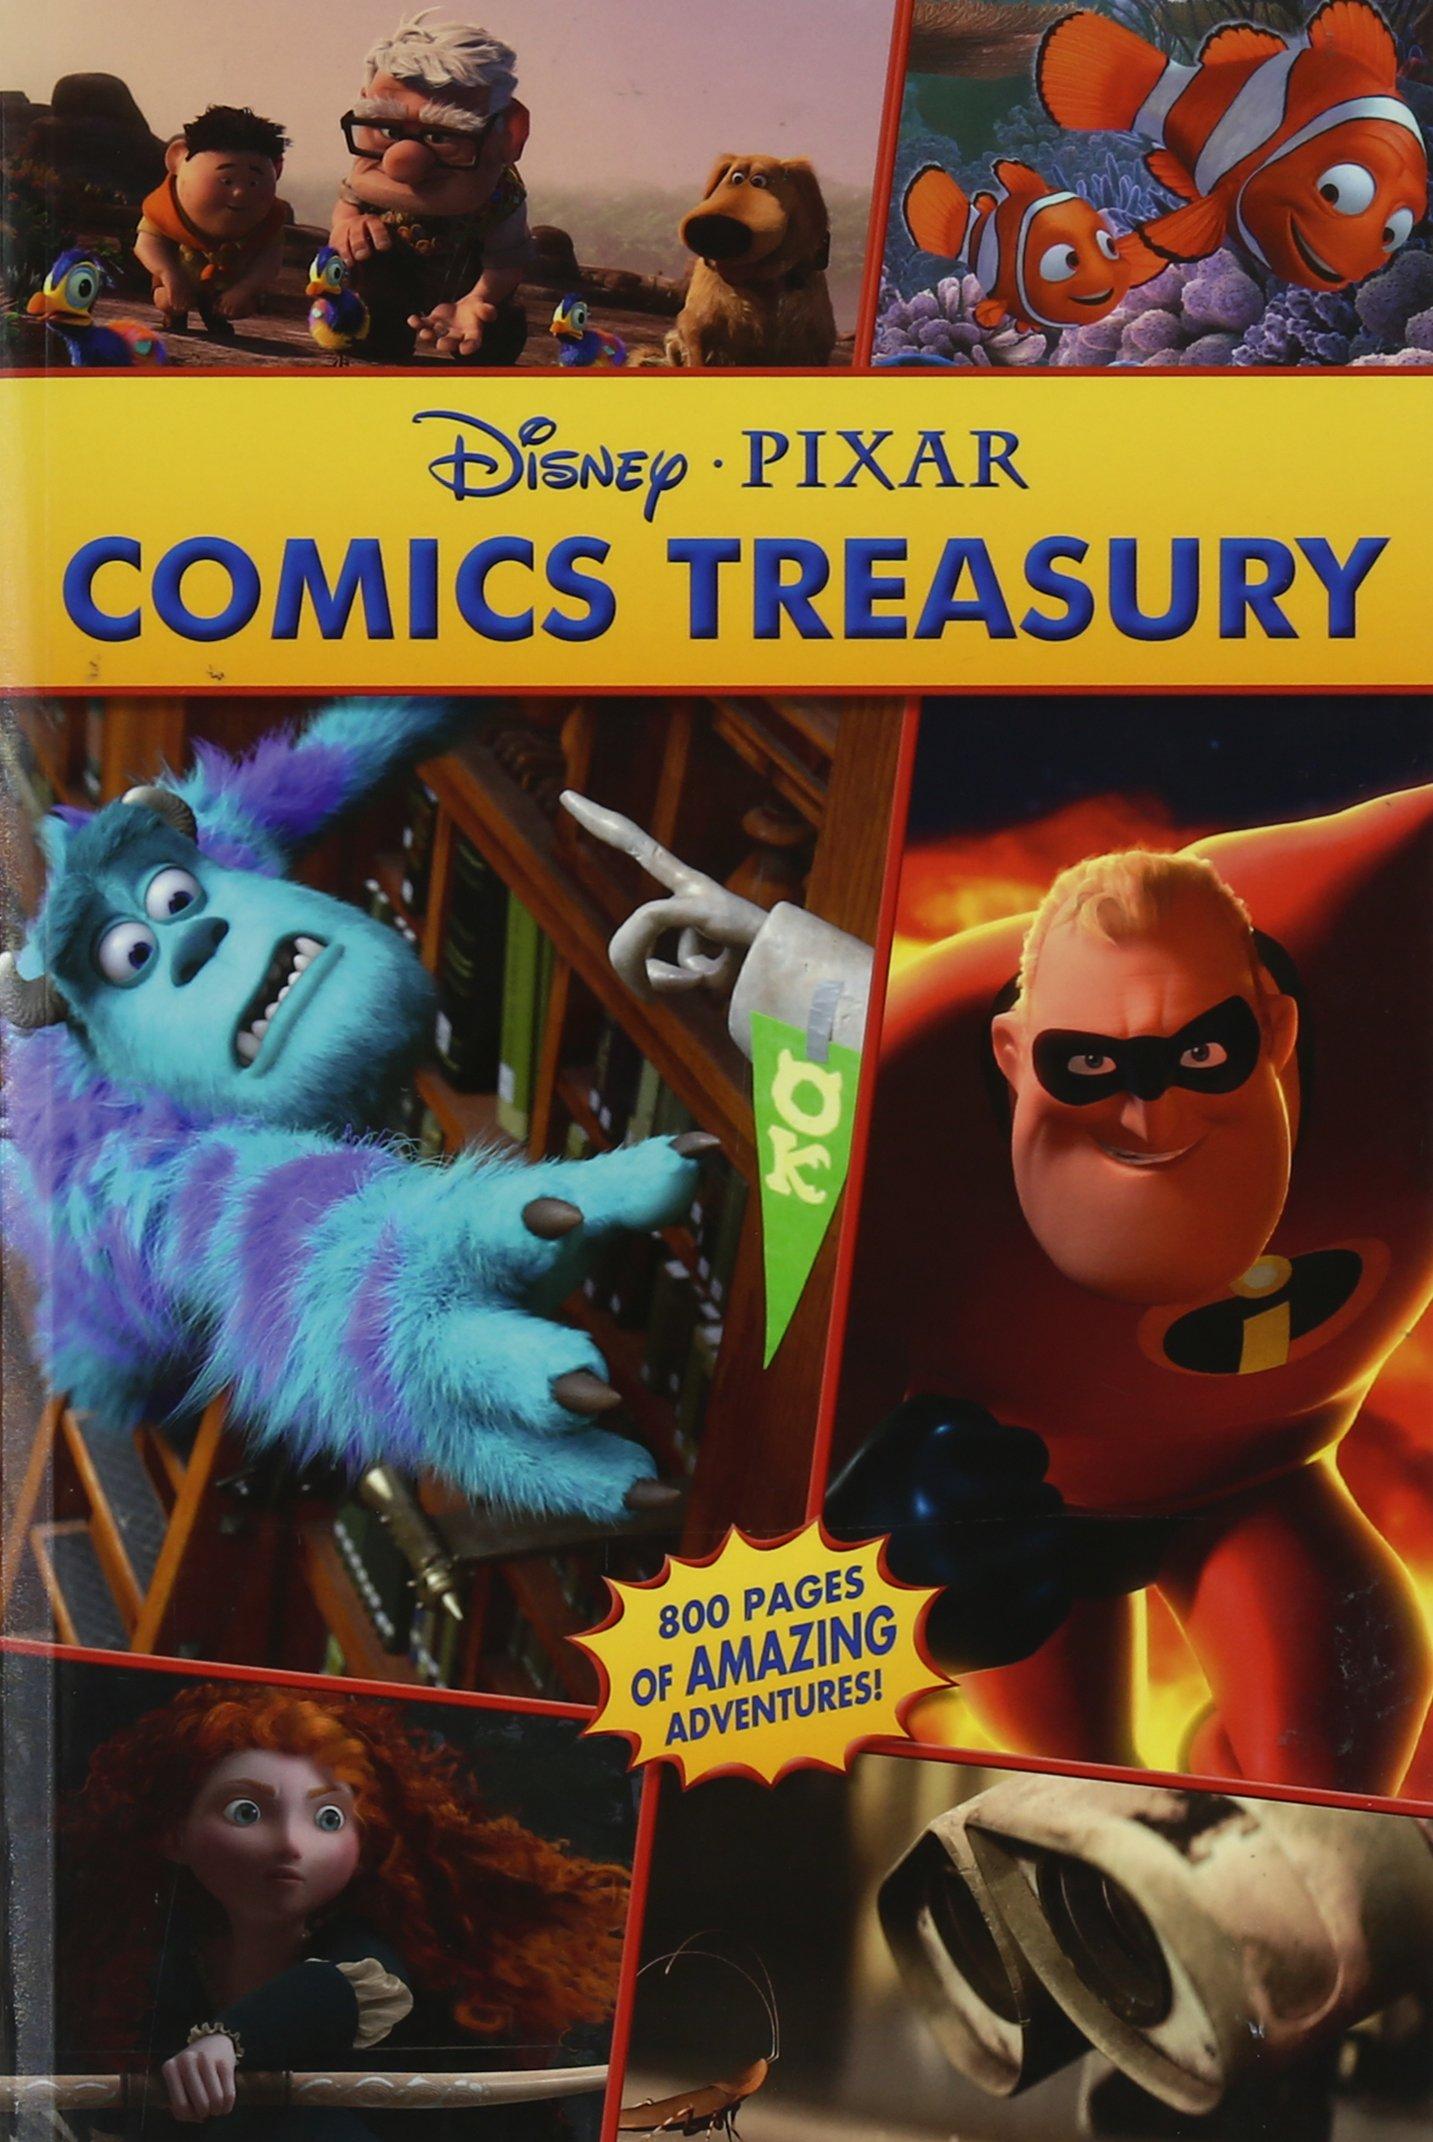 Disney Pixar Treasury Volume 1 Disney Pixar 9781926516011 Books Amazon Ca